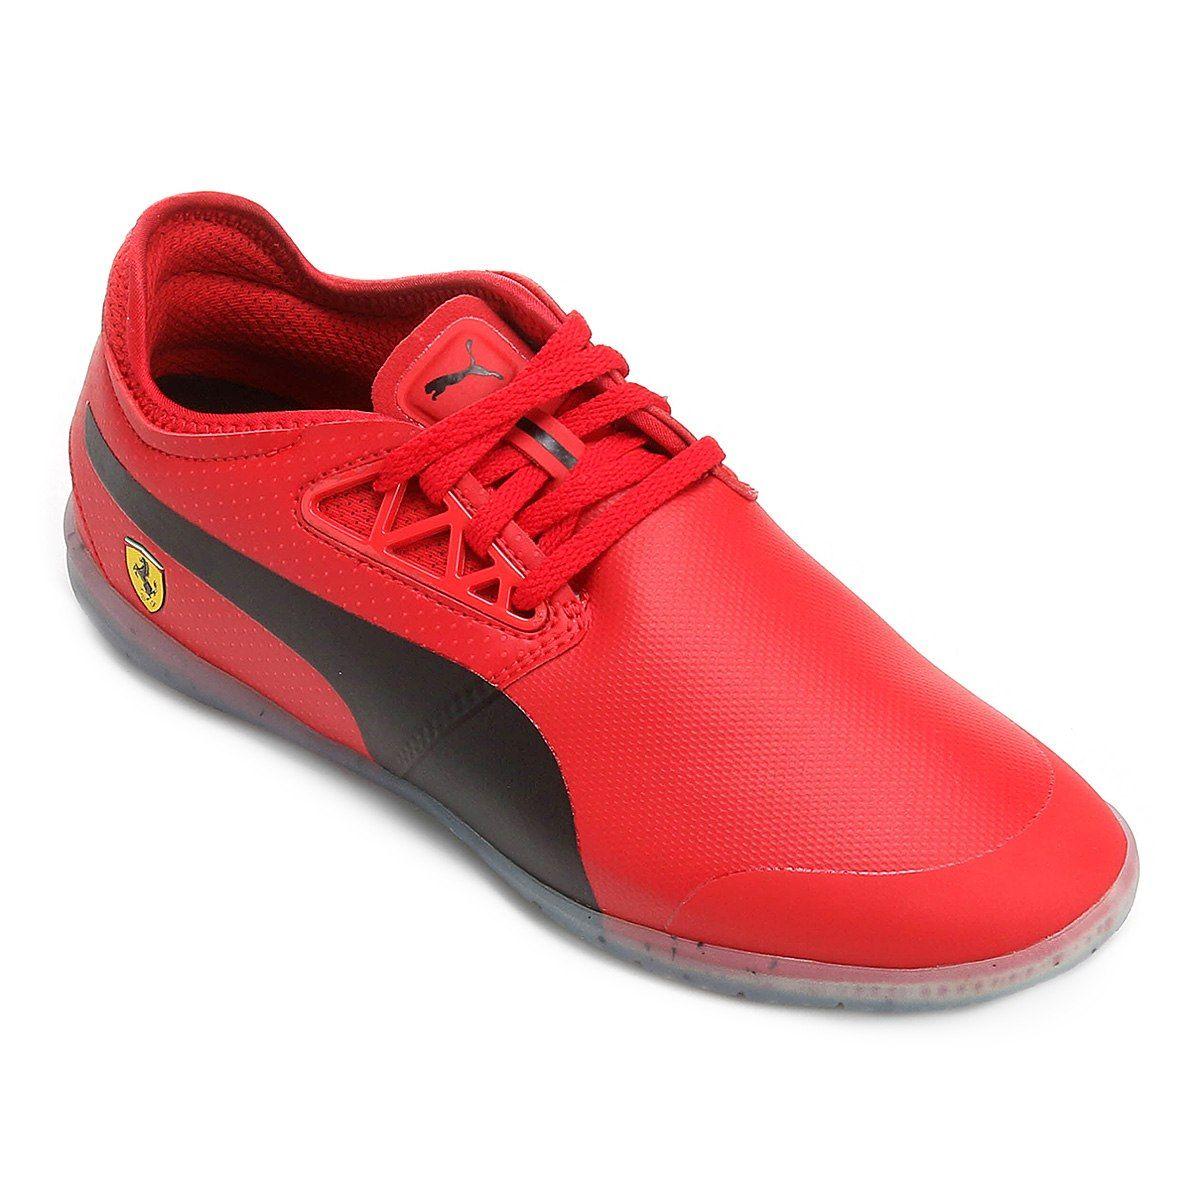 f068e530025 Tênis Puma Scuderia Ferrari Changer Ignite Masculino - Vermelho e Preto